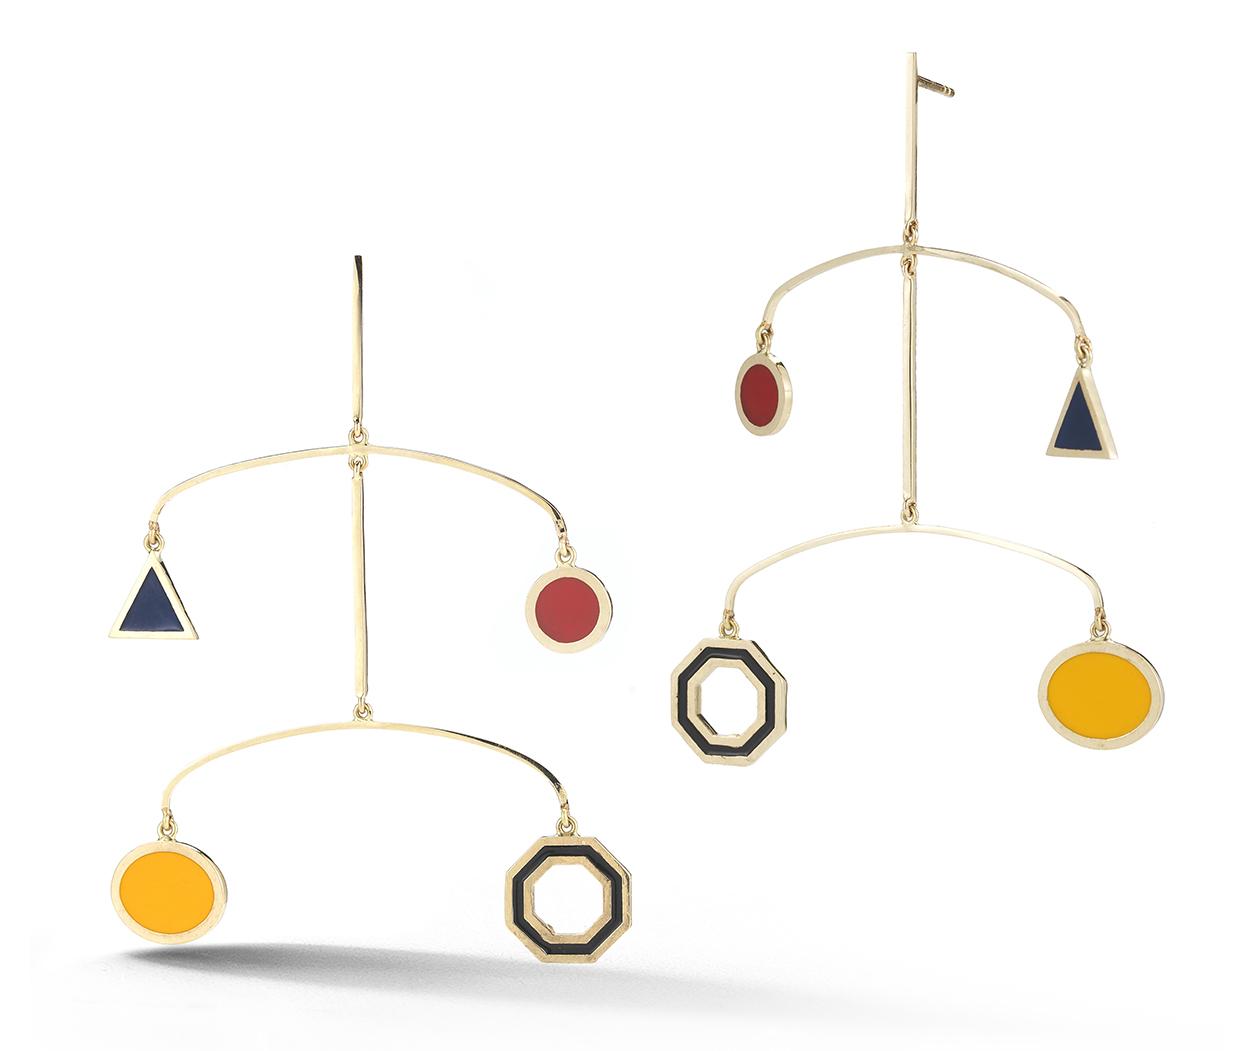 Mateo New York 14 Karat Gold Enamel Mobile Installation Earring 1950 Mateonewyork